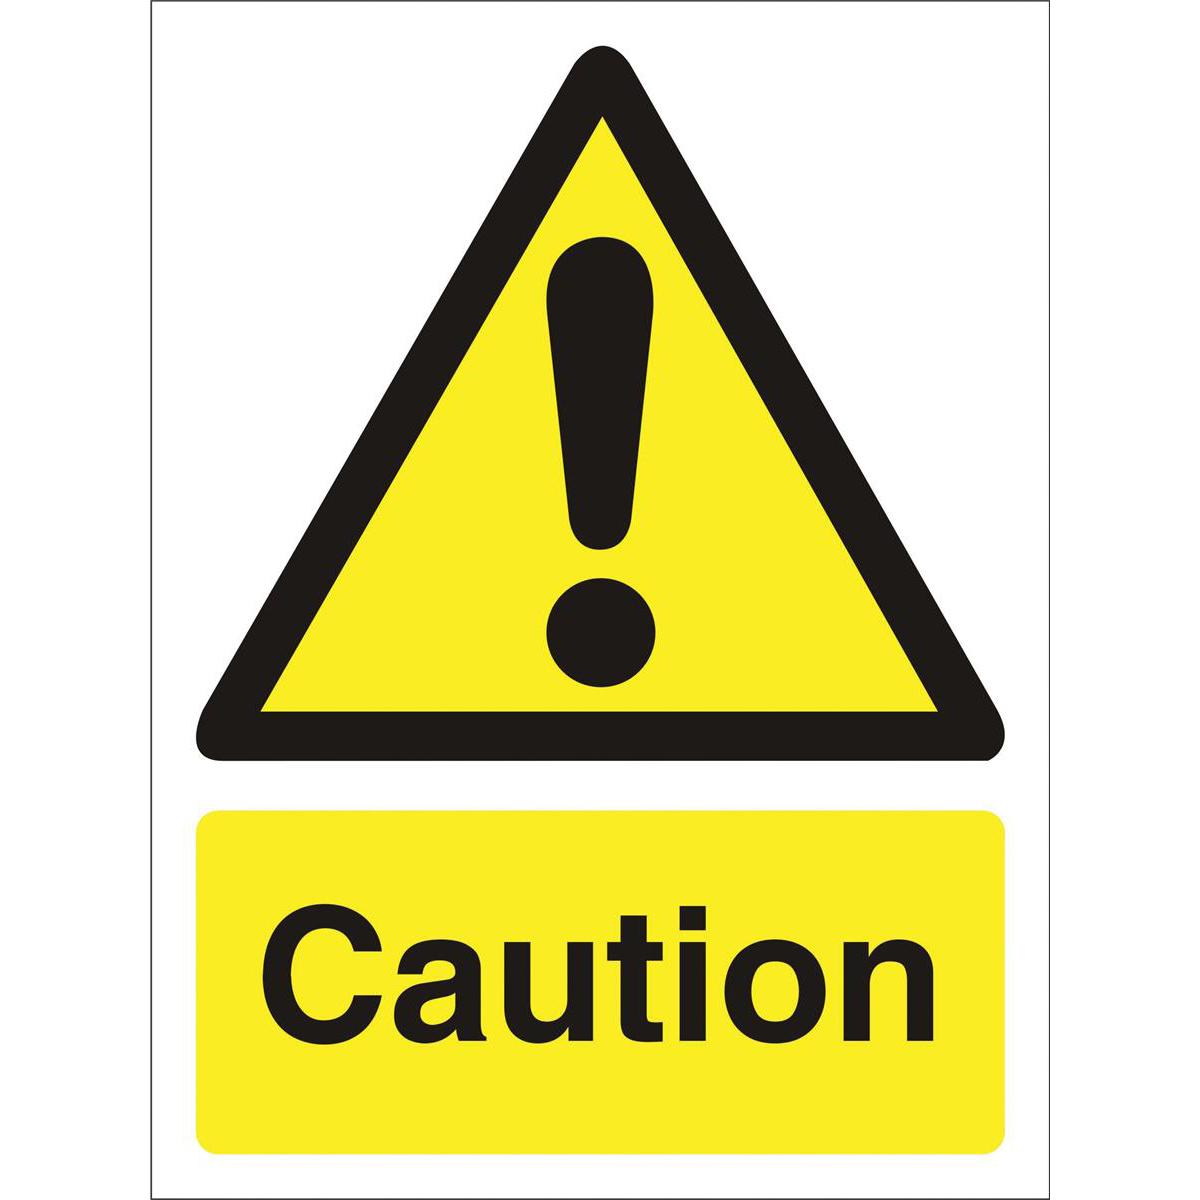 Stewart Superior Caution logo only W150xH200mm Self-adhesive Vinyl Ref WO125SAV